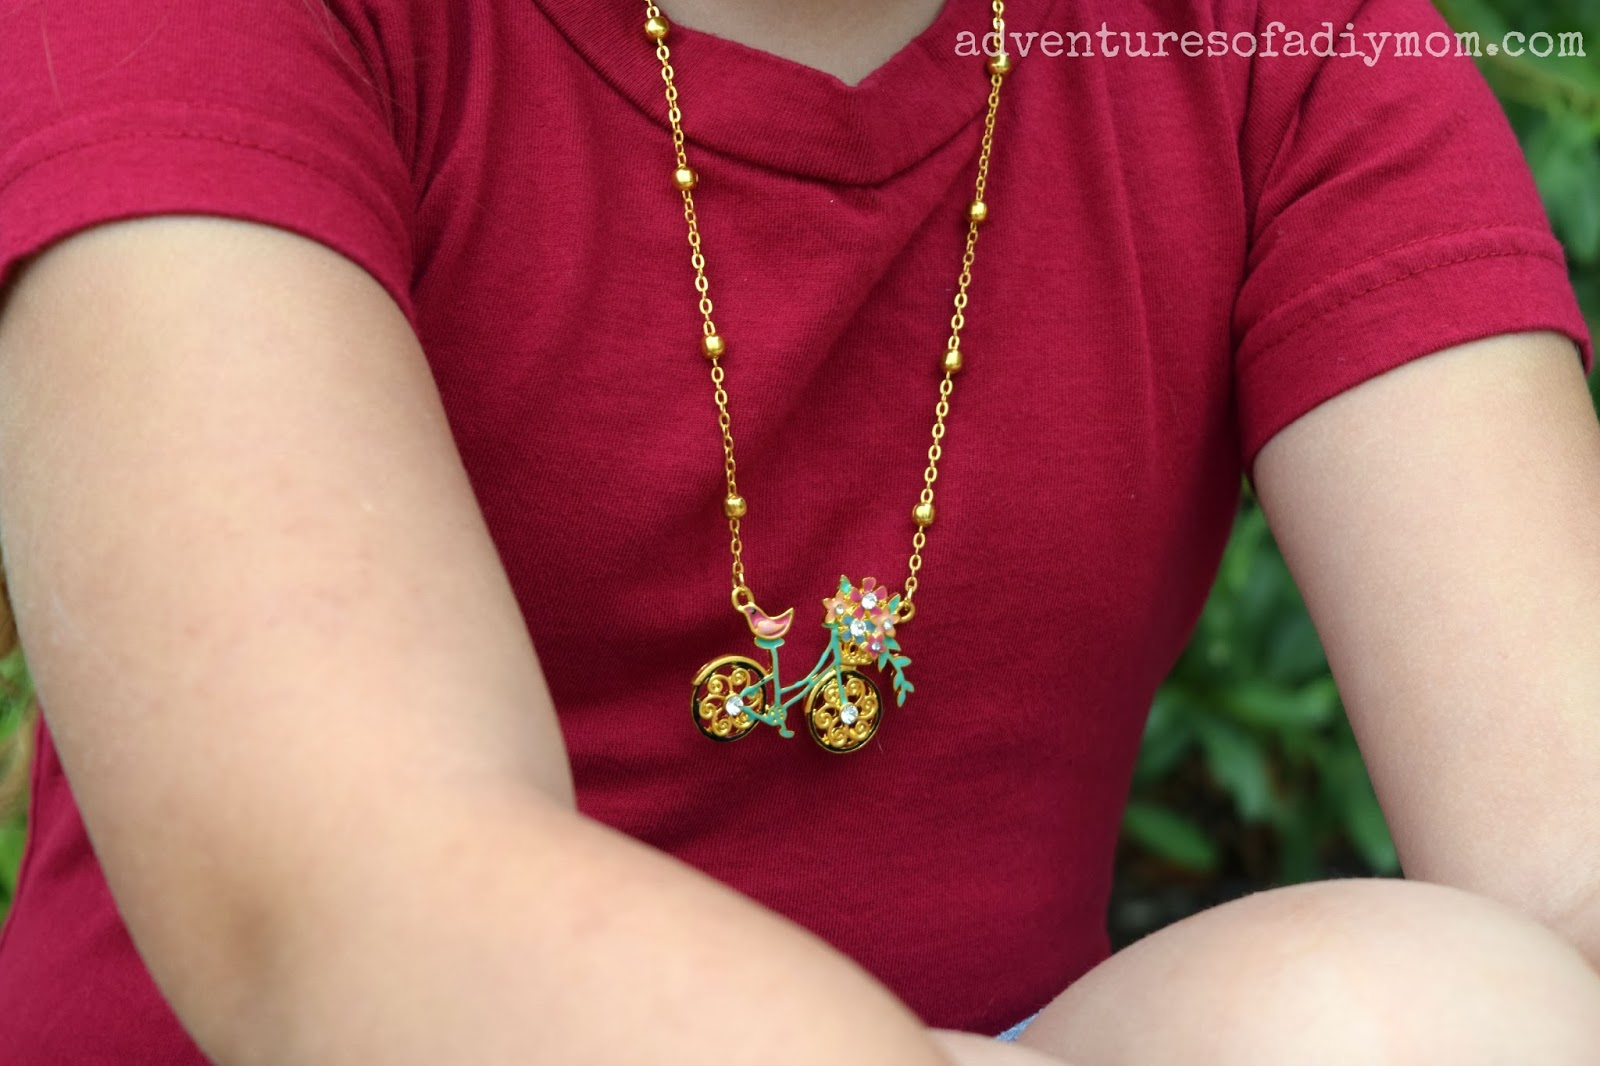 Bike Necklace - Adventures of a DIY Mom